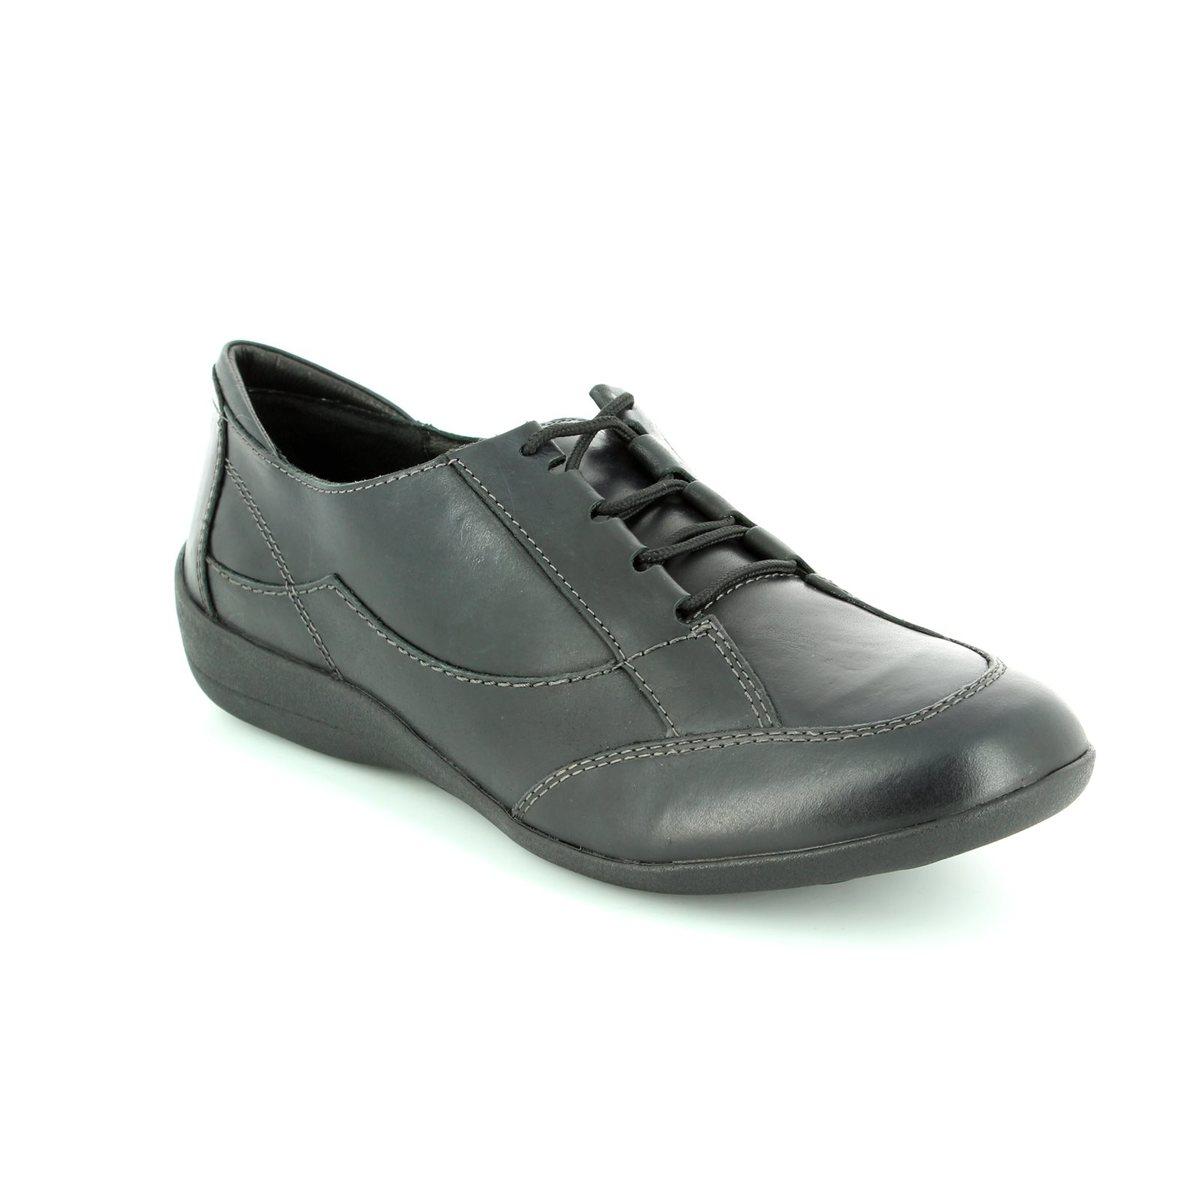 0f075f858c22e Padders Lacing Shoes - Black - 0050/10 GLADE 2E FIT